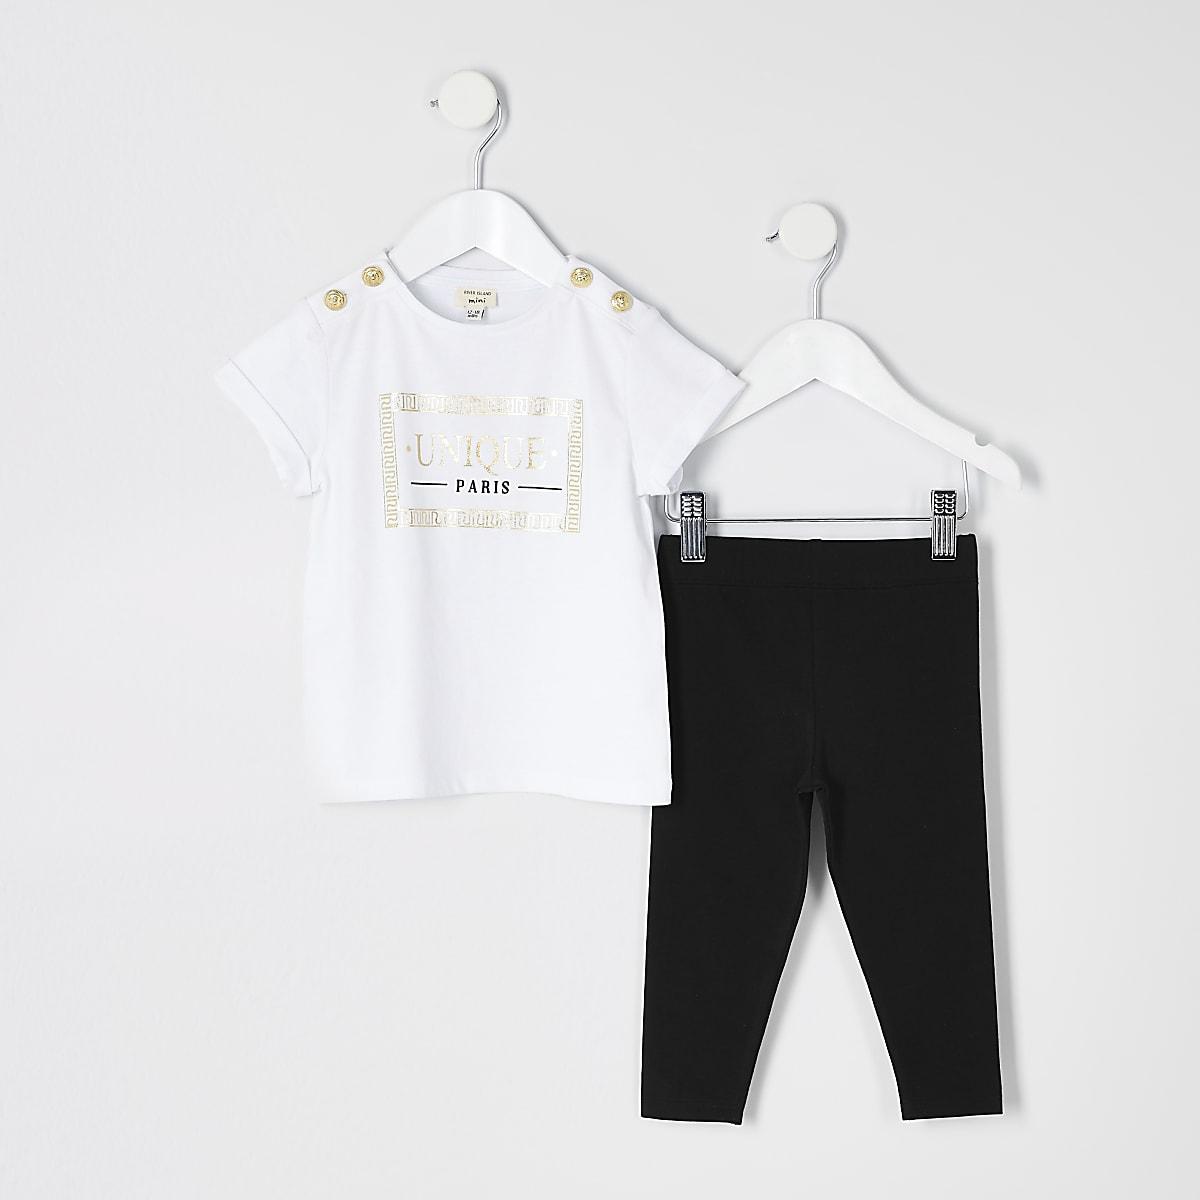 Mini girls white 'Unique' T-shirt outfit